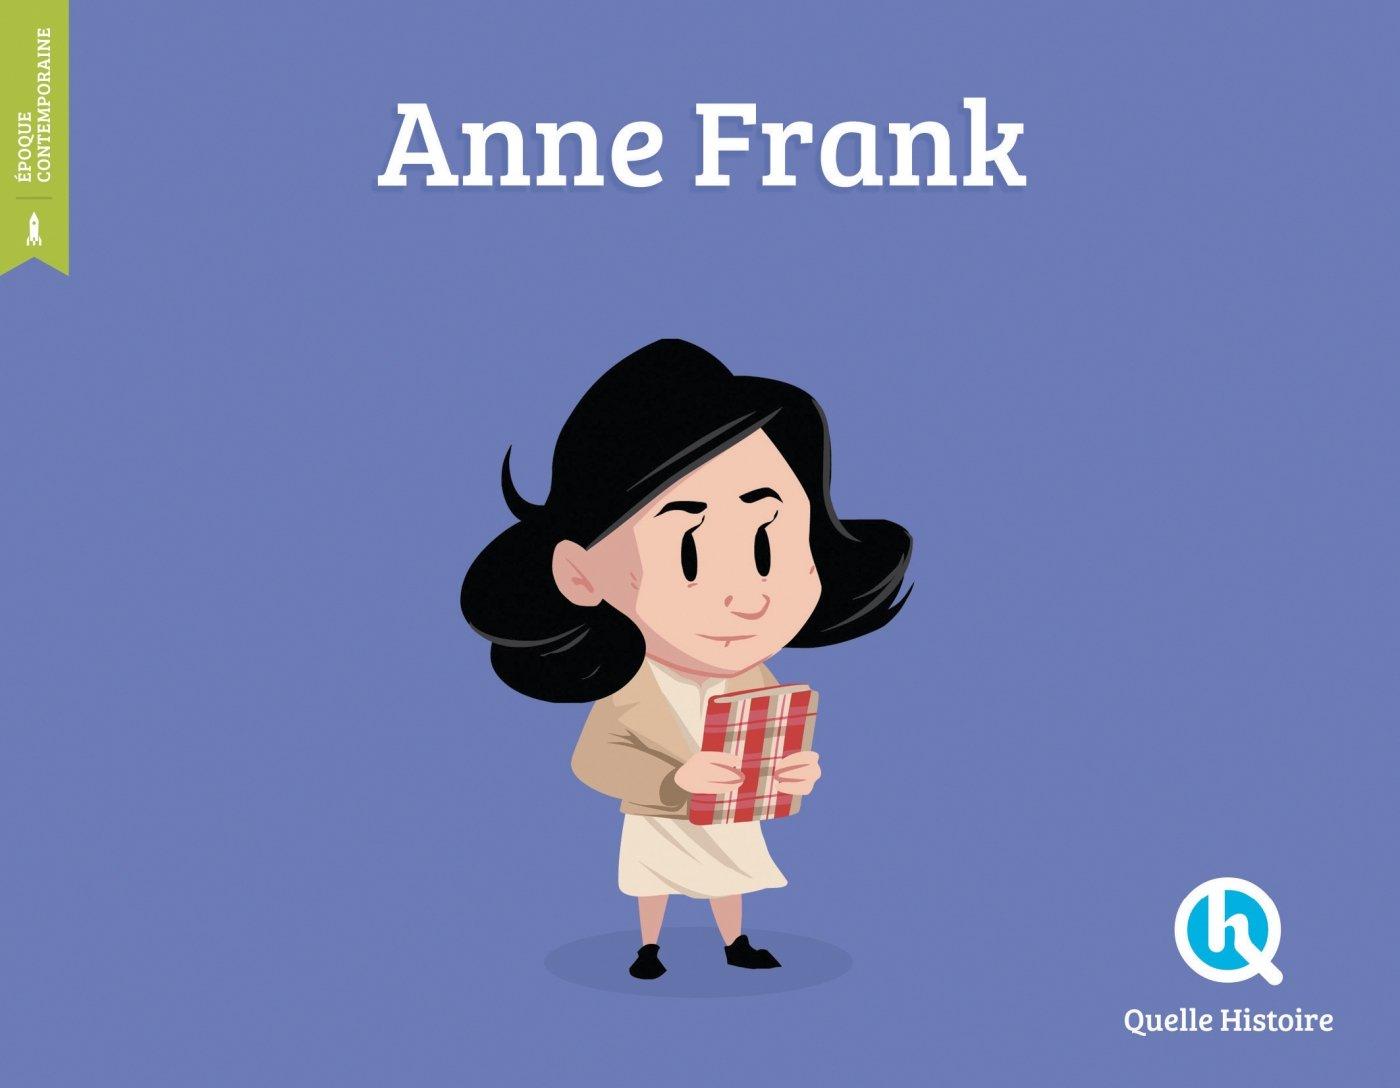 Anne Frank Broché – 10 novembre 2017 Clémentine V. Baron Nuno Alves Rodrigues Quelle Histoire Editions 2371043656